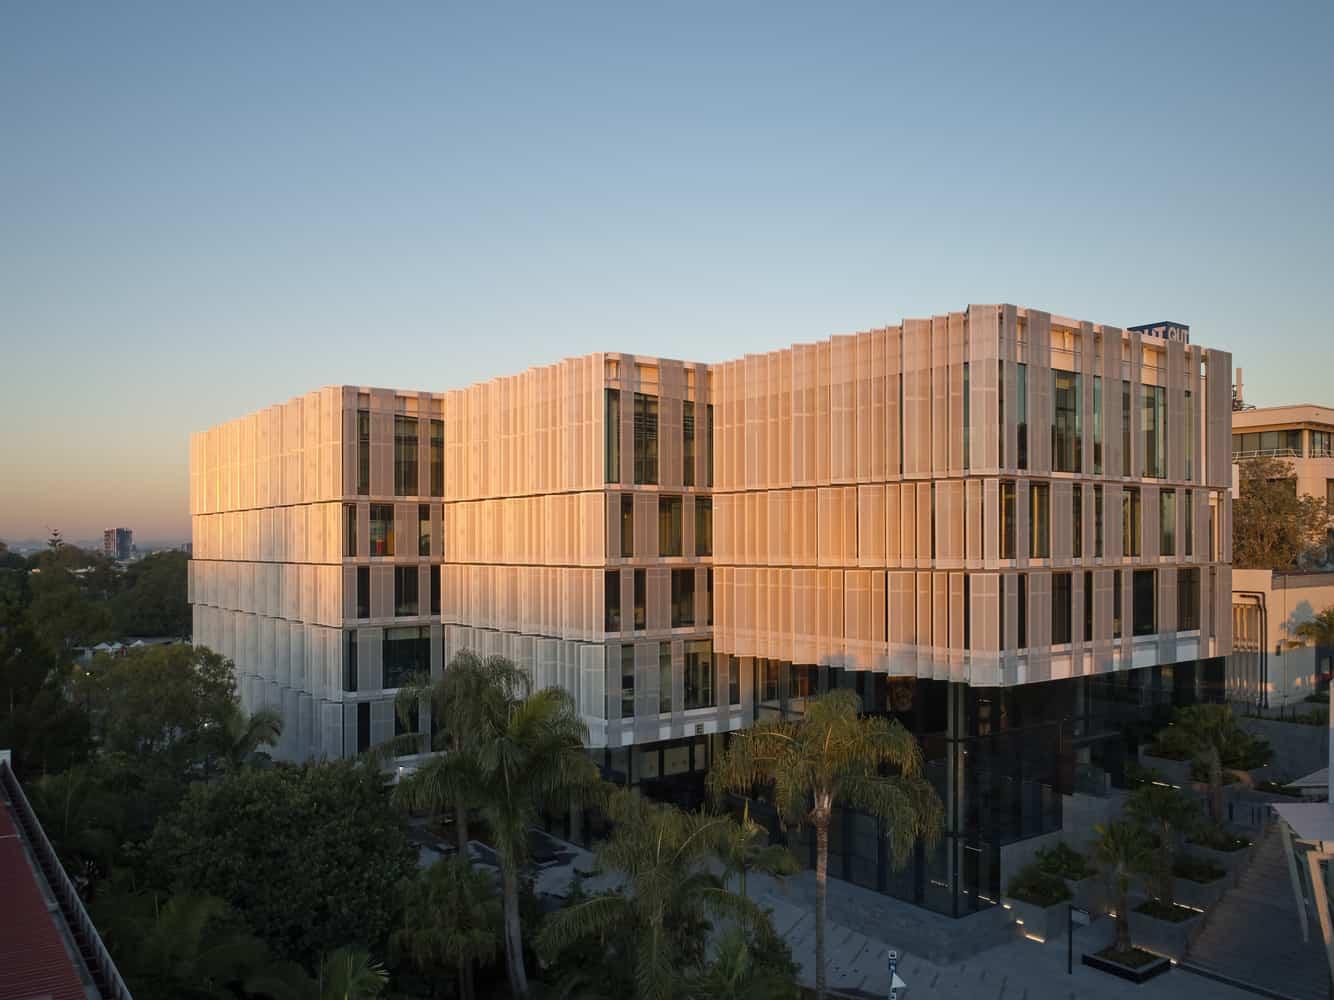 Innovative learning centre Peter Coaldrake Education Precinct created on Australian campus by Wilson Arquitetura